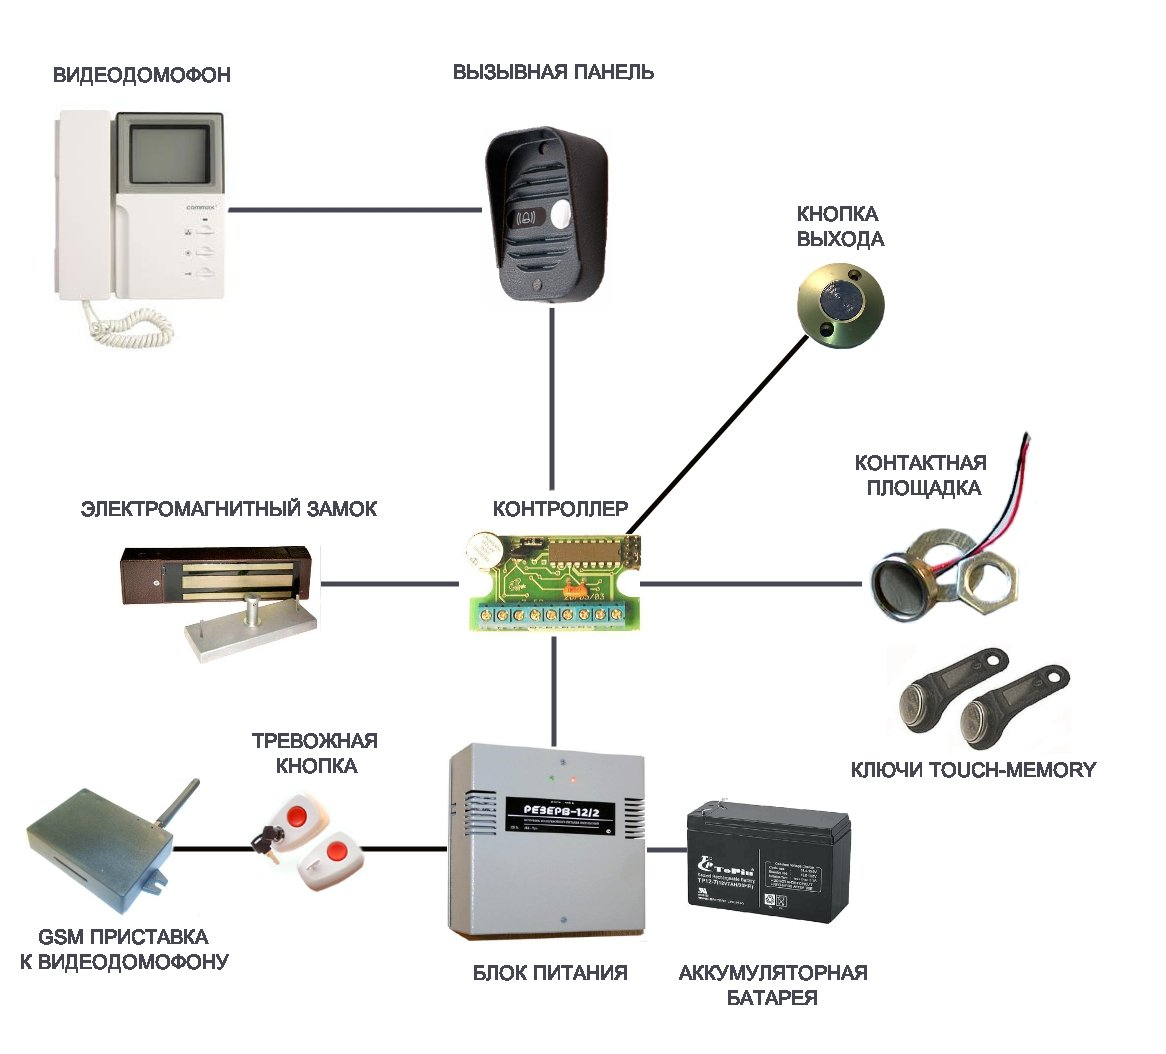 Контроллер электромеханического замка схема